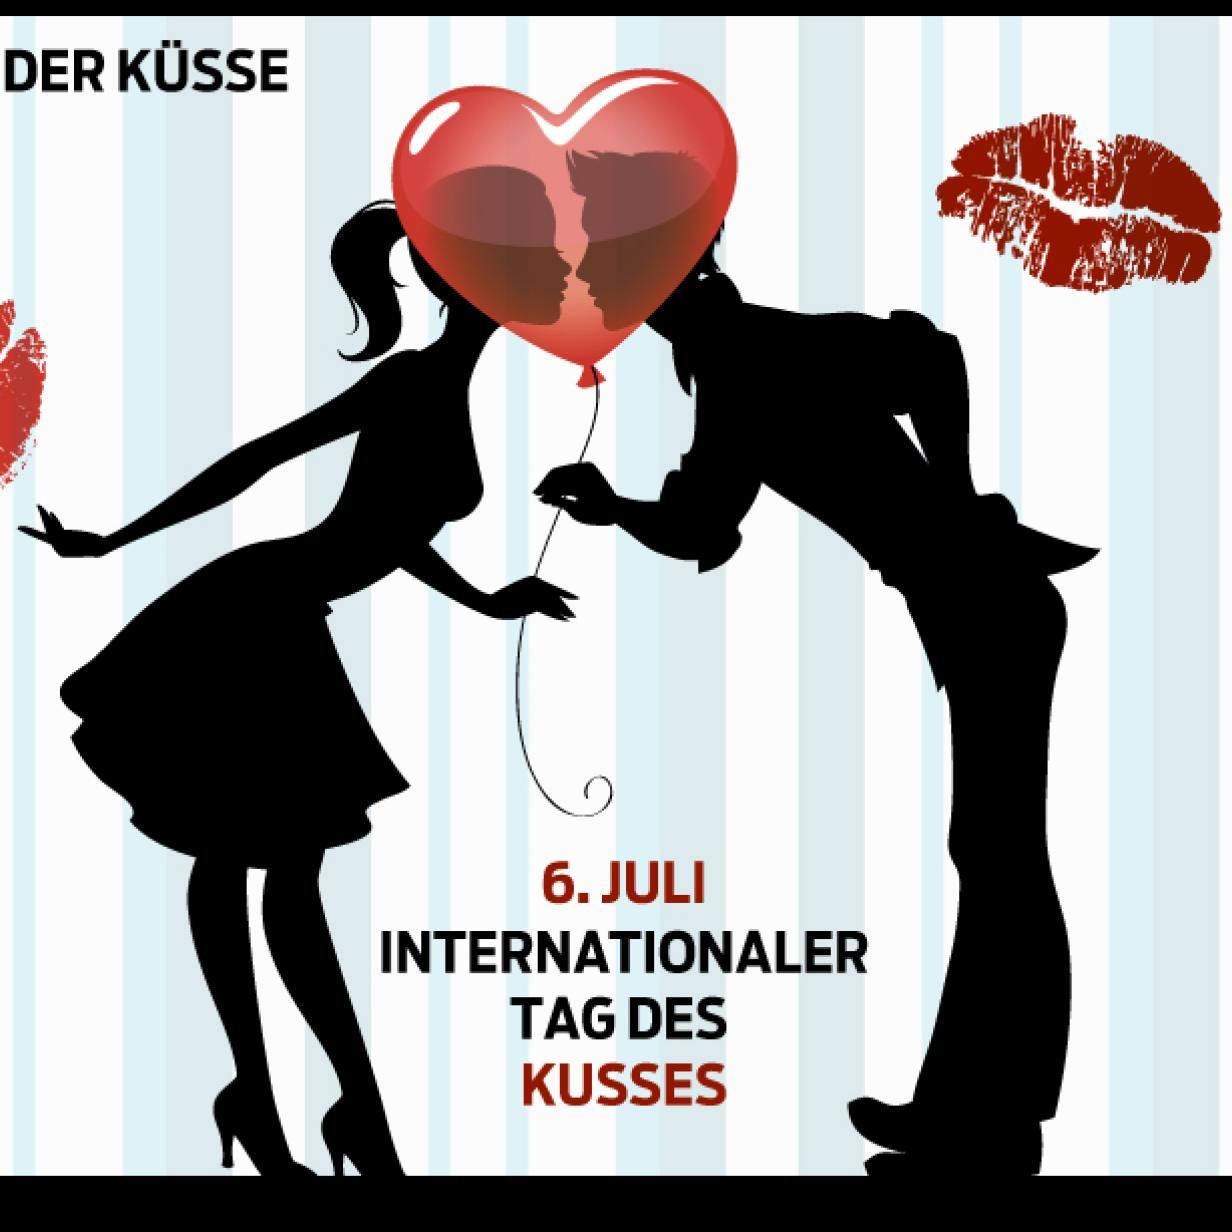 Tag des kusses 2016 internationaler Die skurrilsten